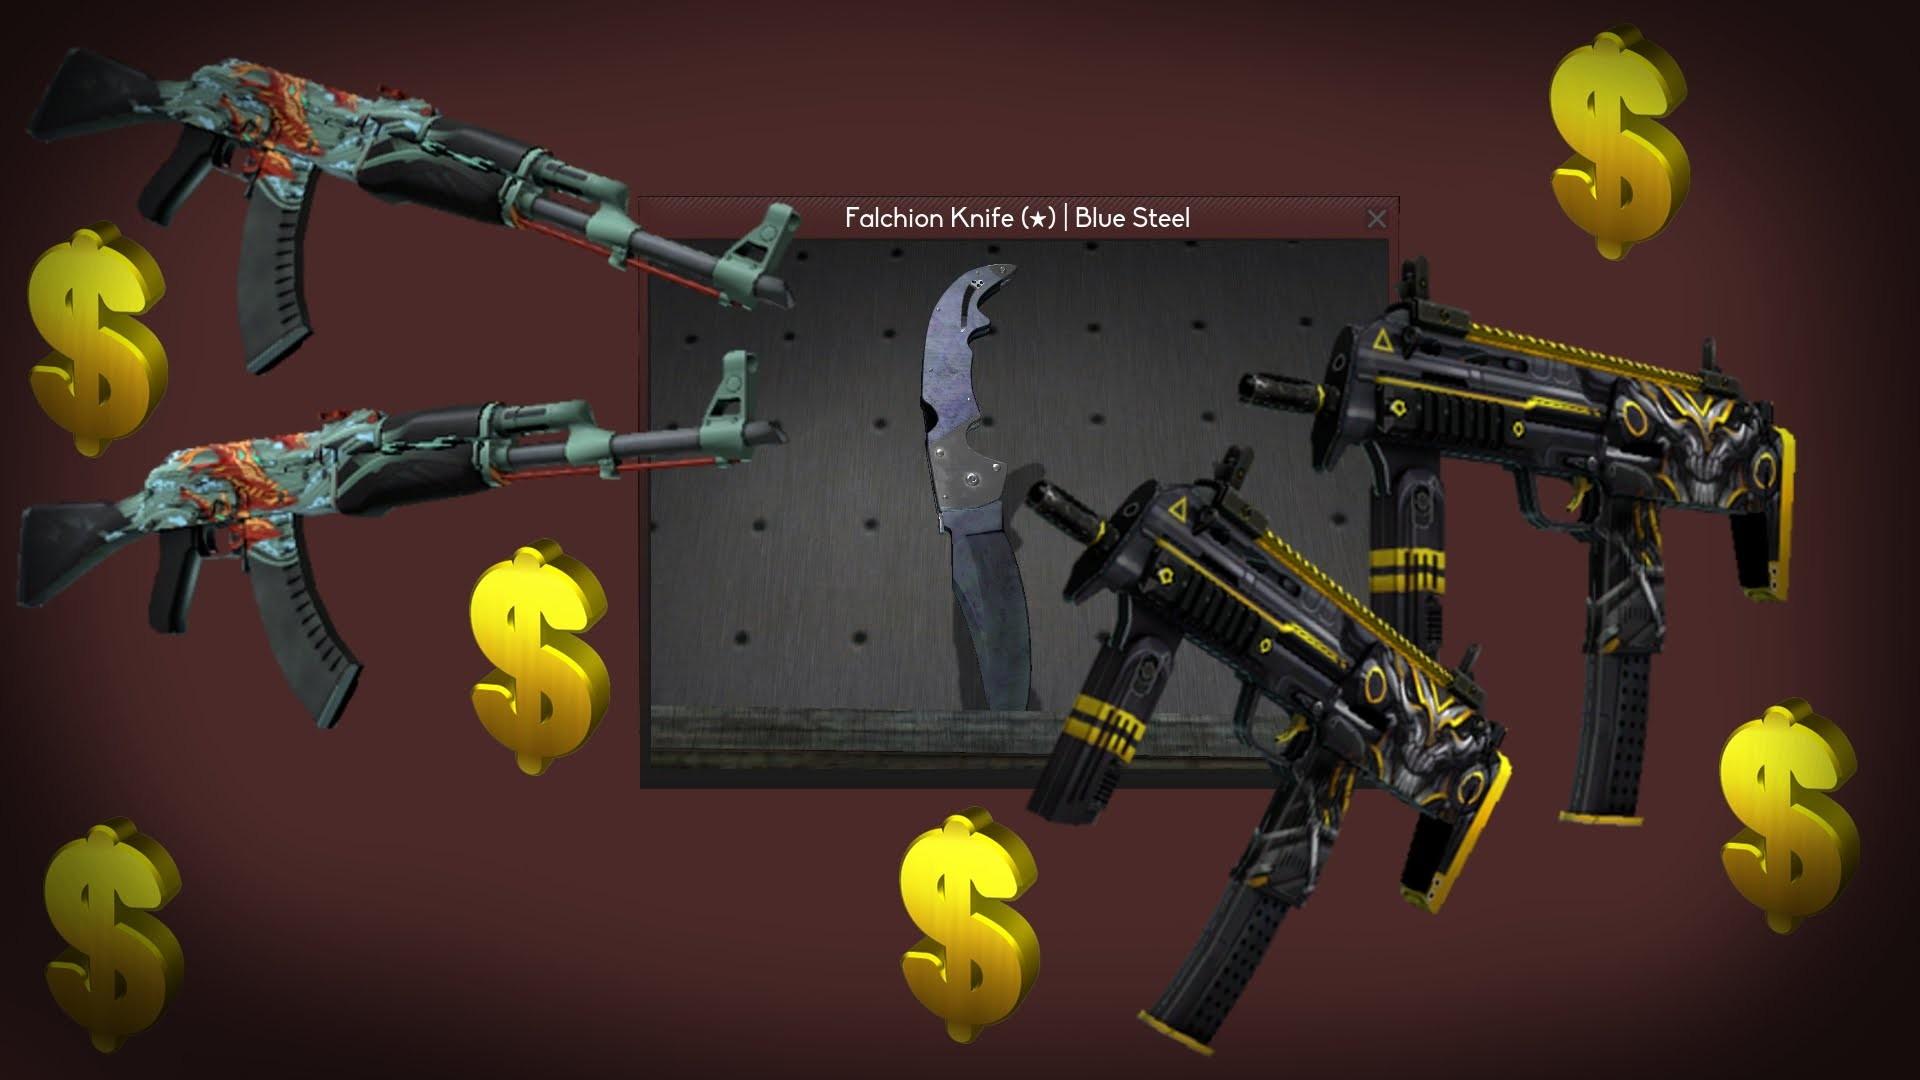 CS:GO – Falchion Knife | Fade & Blue Steel, AK-47, MP7 Unboxing [HD] –  YouTube